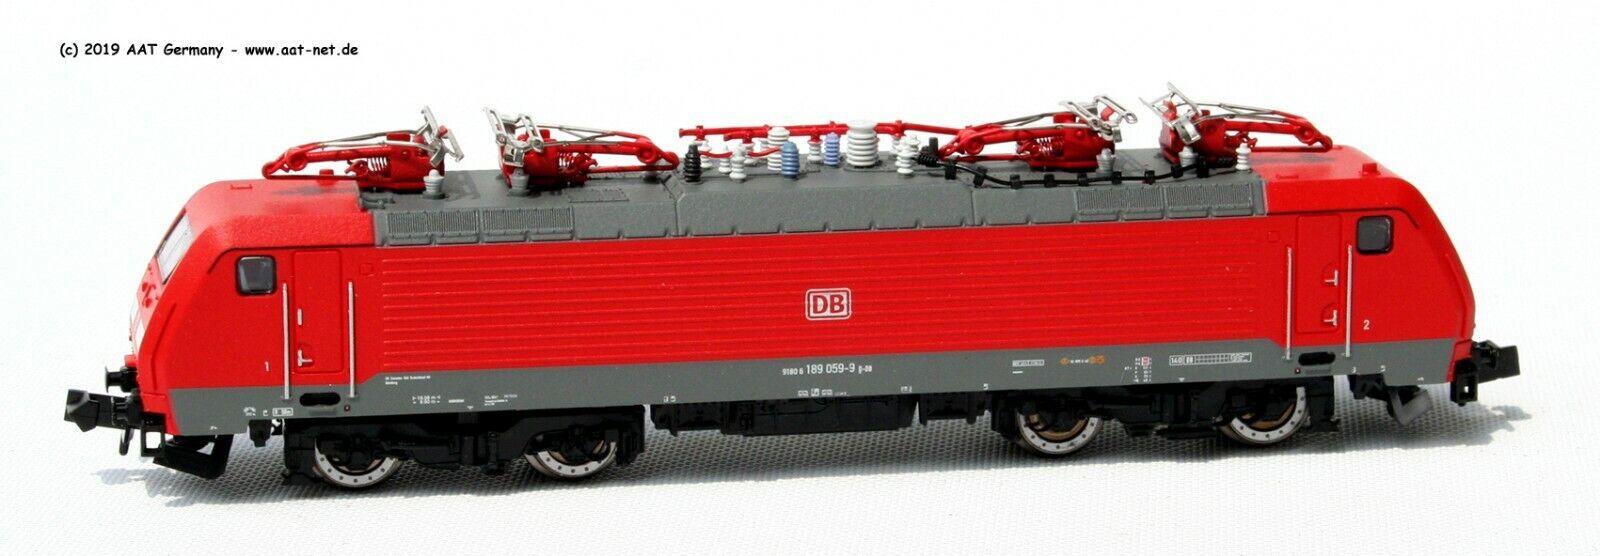 Minitrix N 16893 - E-Lok BR 189 059-9 DB AG  Ep. VI Digital NEU & OVP